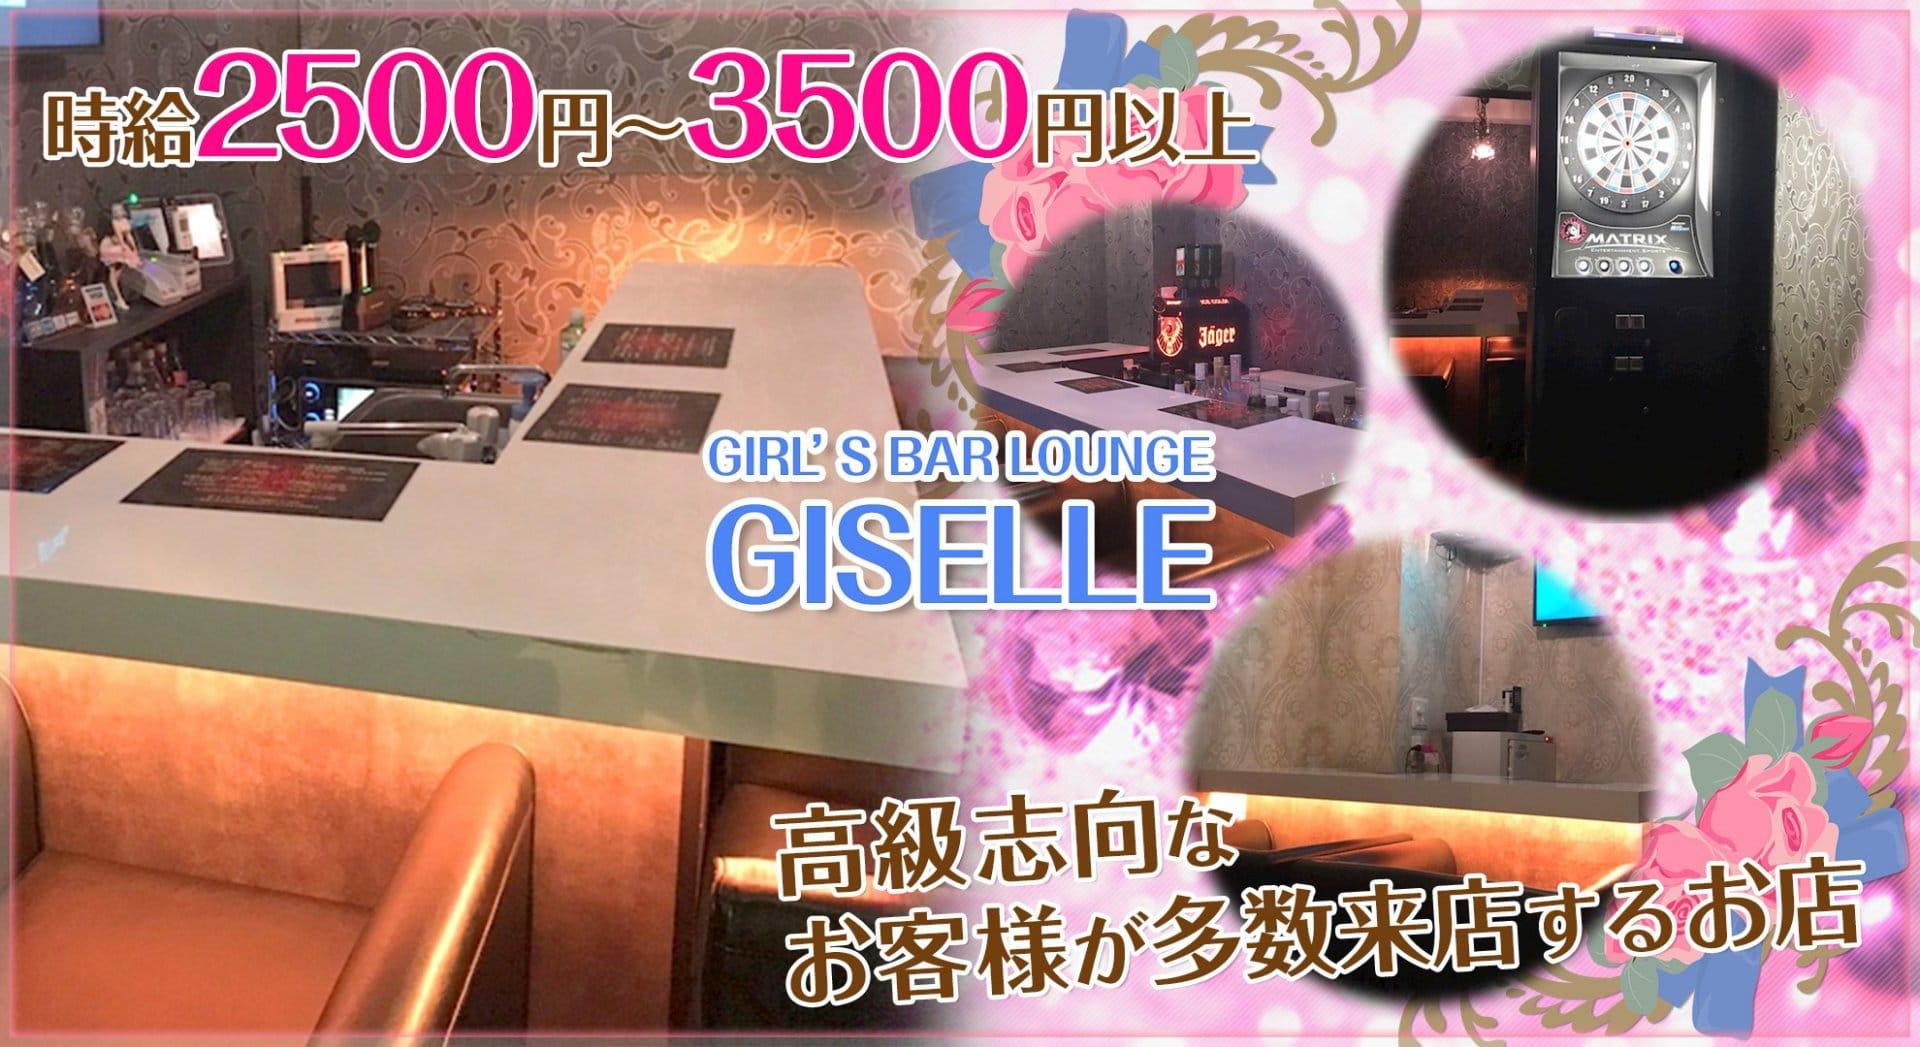 GISELLE (ジゼル) 神楽坂ガールズバー TOP画像